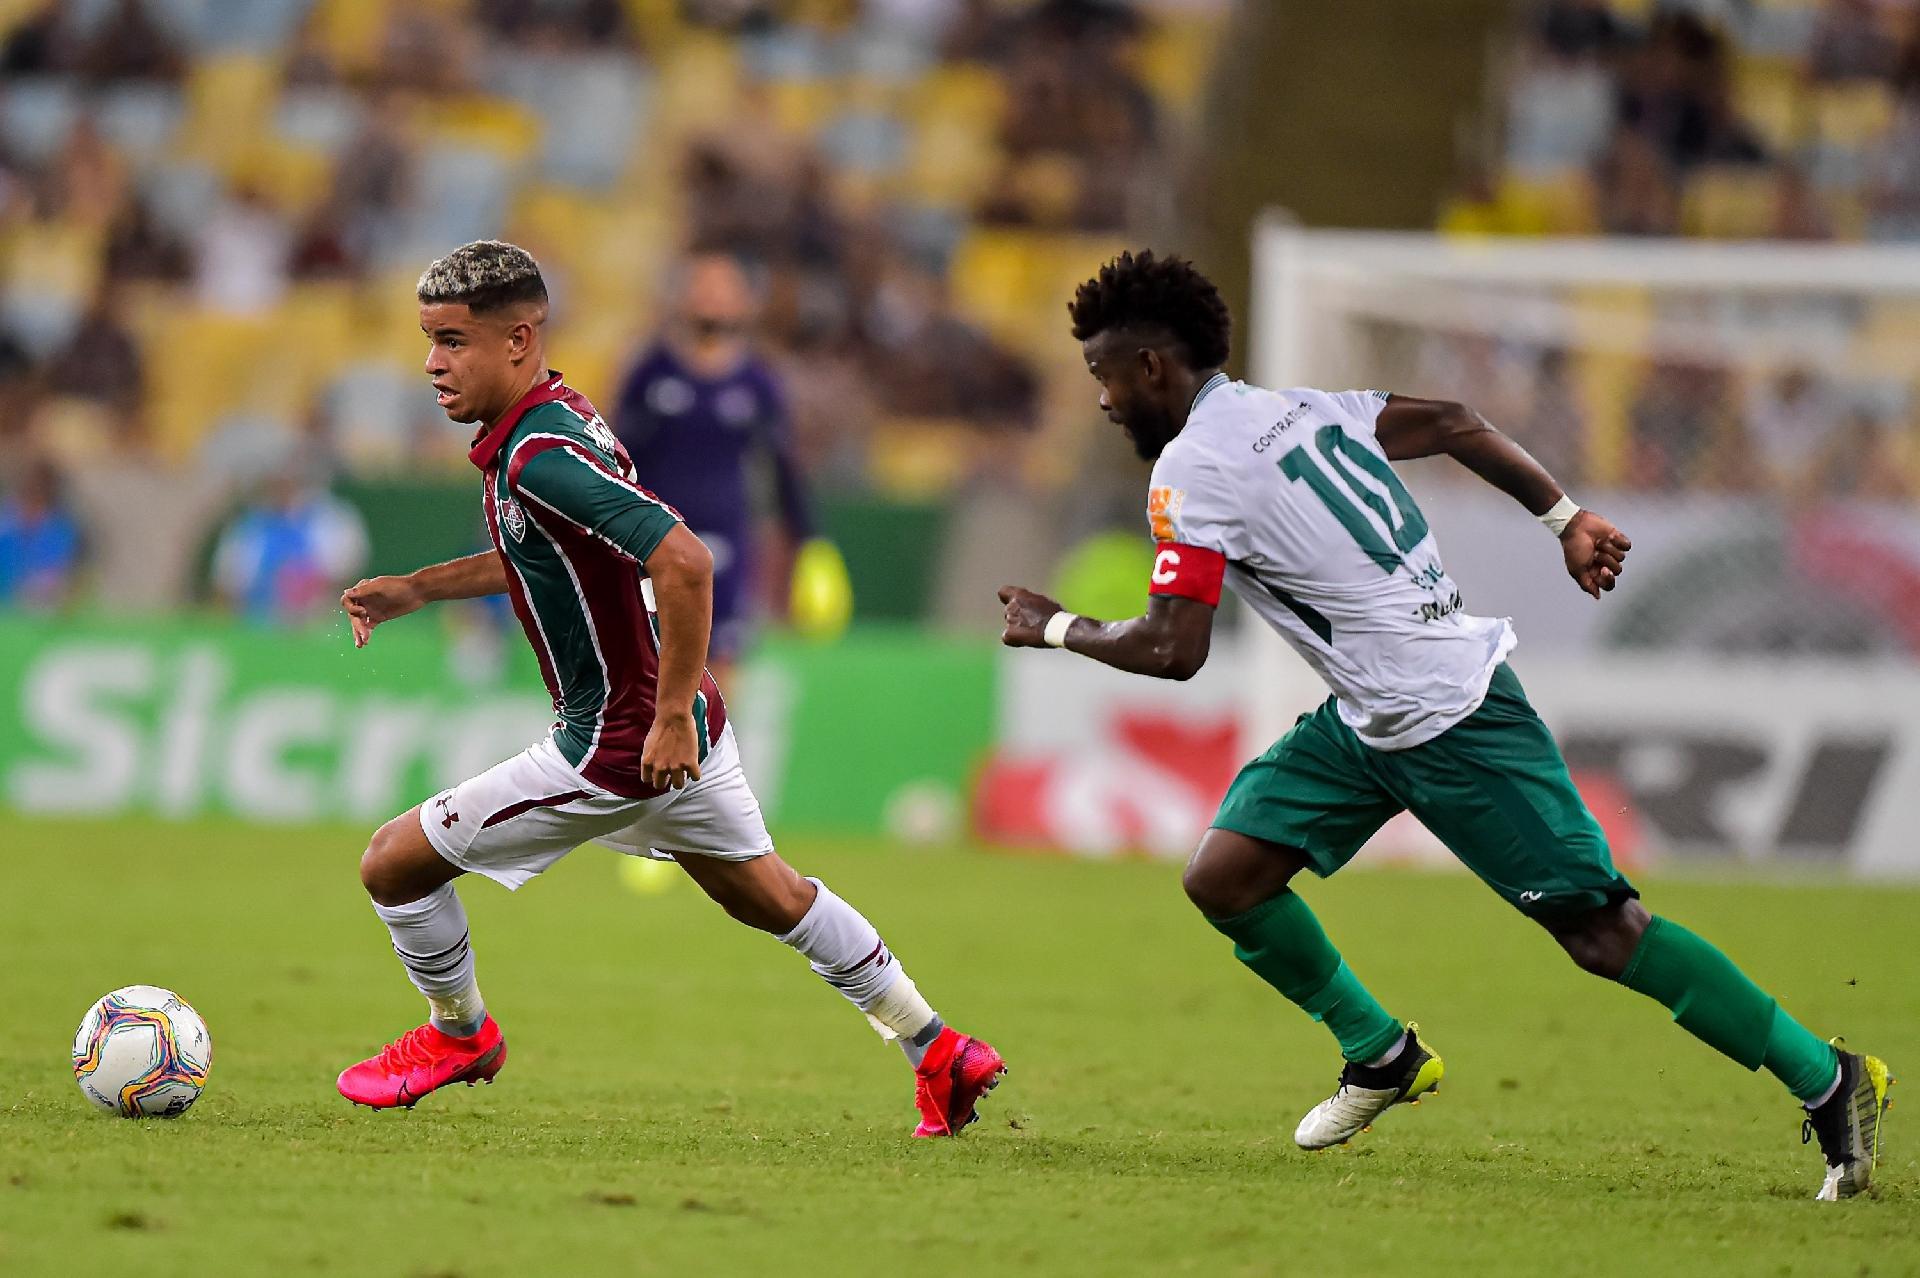 Miguel, do Fluminense, disputa lance com Erick Flores